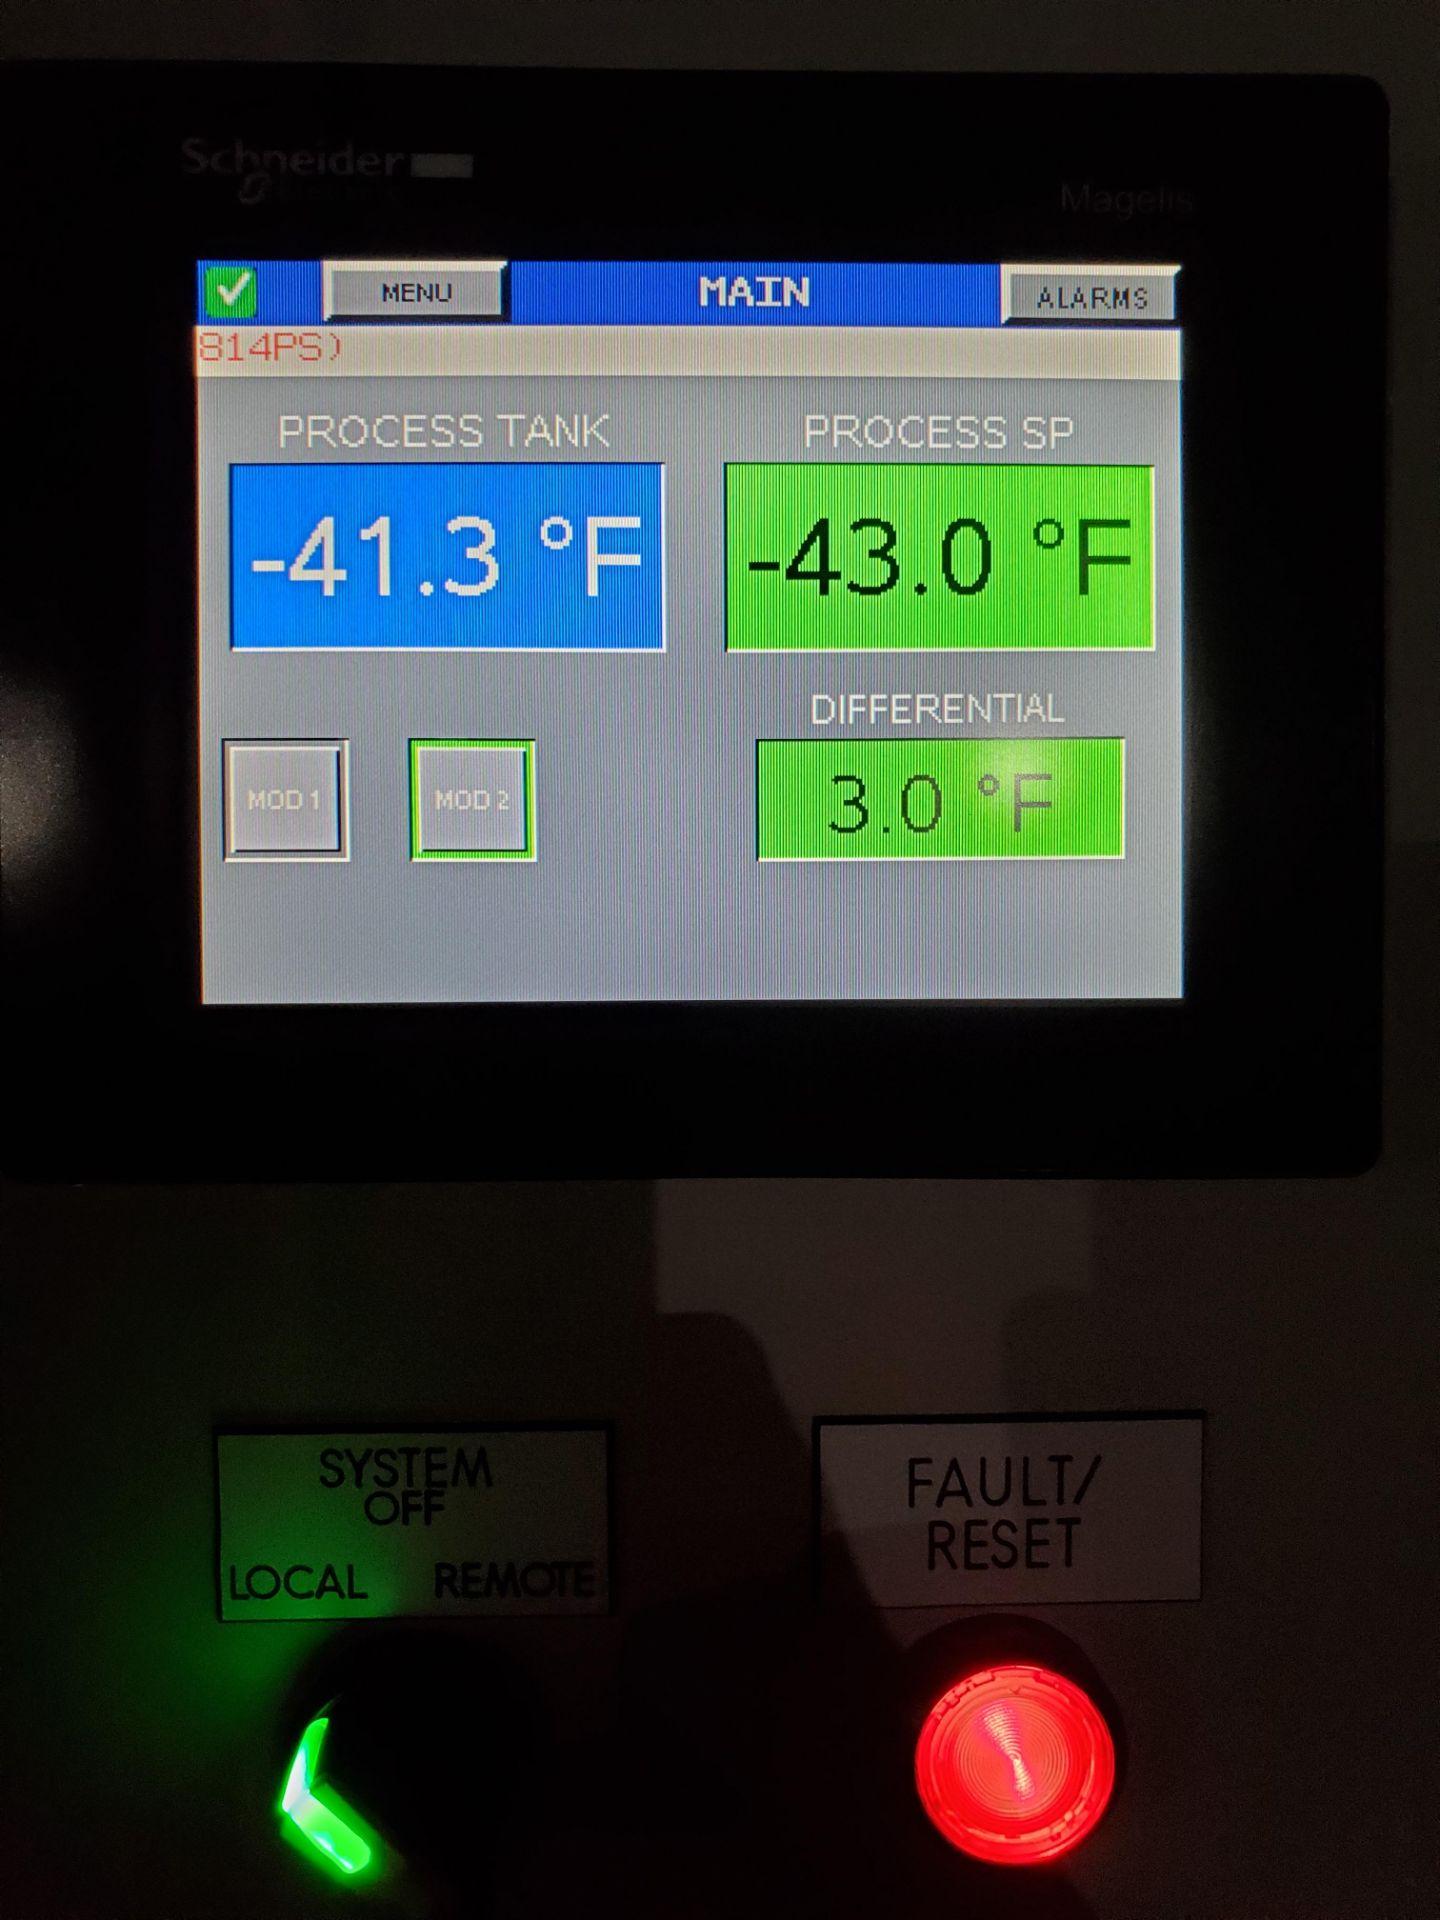 Unused-Fluid Chillers Inc -40 C Water-Cooled Fluid Chiller. Model WAT50,000-DC-ULT-RS. Cap: 42.4 kW - Image 7 of 7